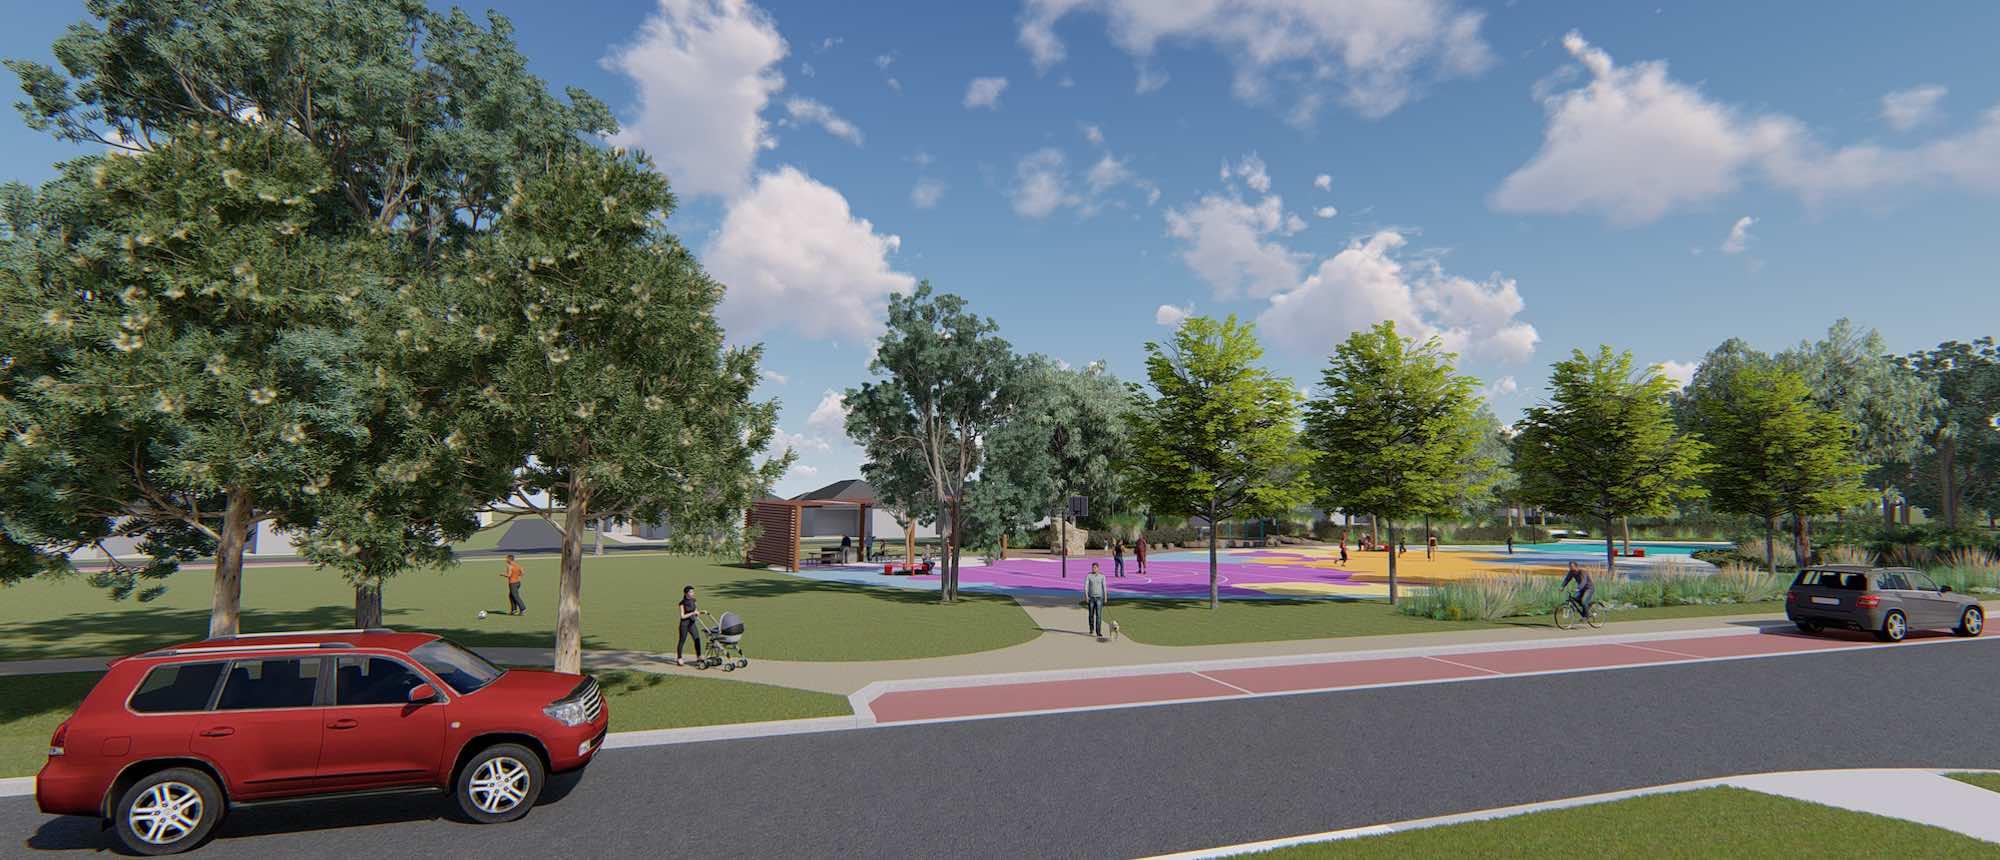 Vasse-new-park-pump-track-courts-bbqs-trees